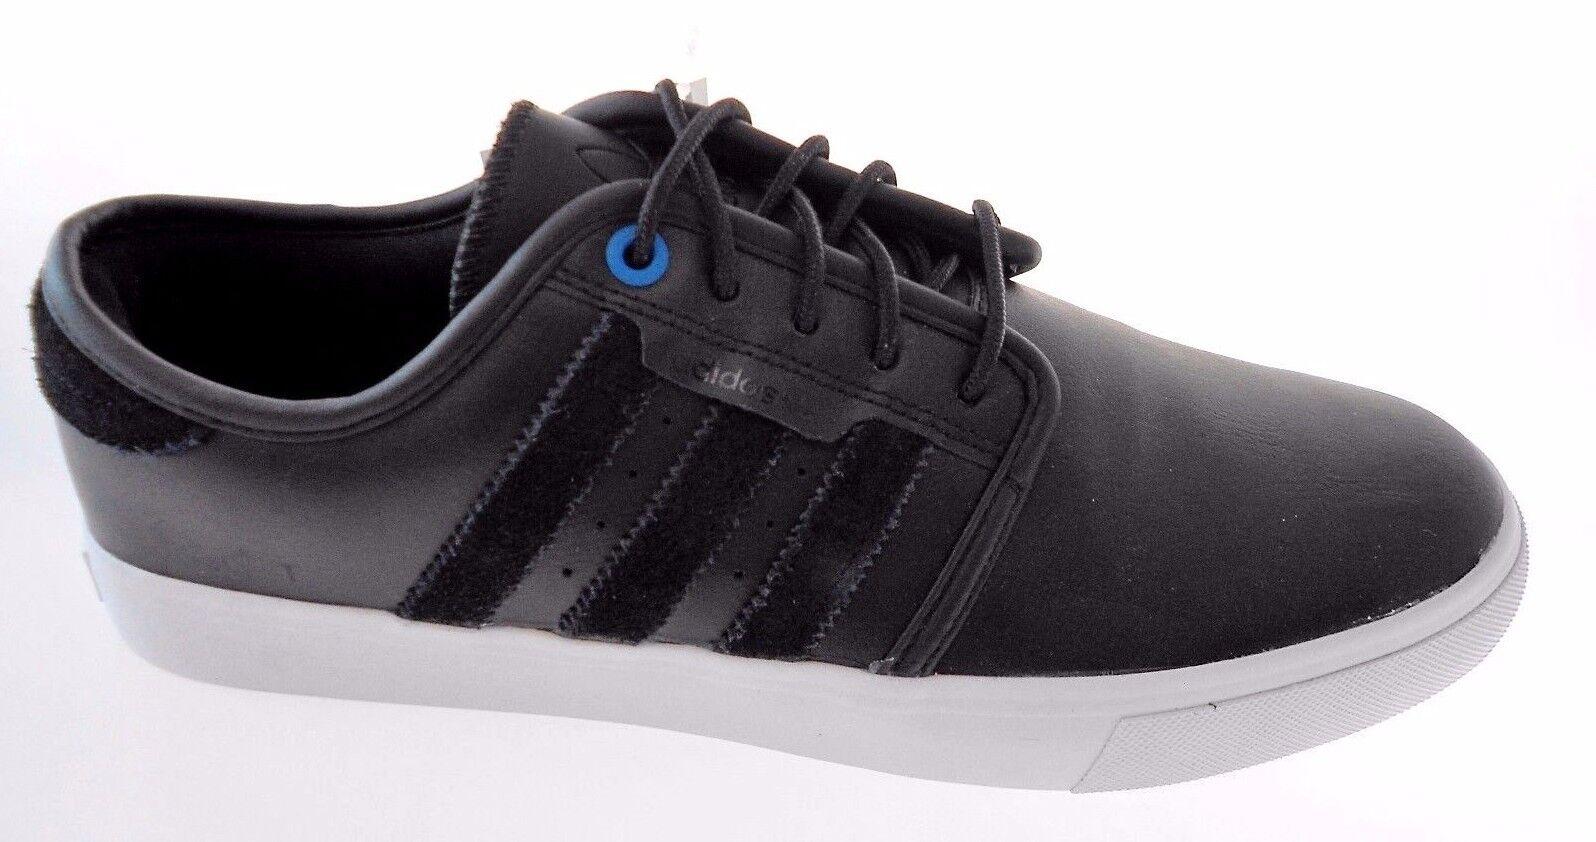 Adidas originals seeley männer schwarze leder skateboard - schuhe